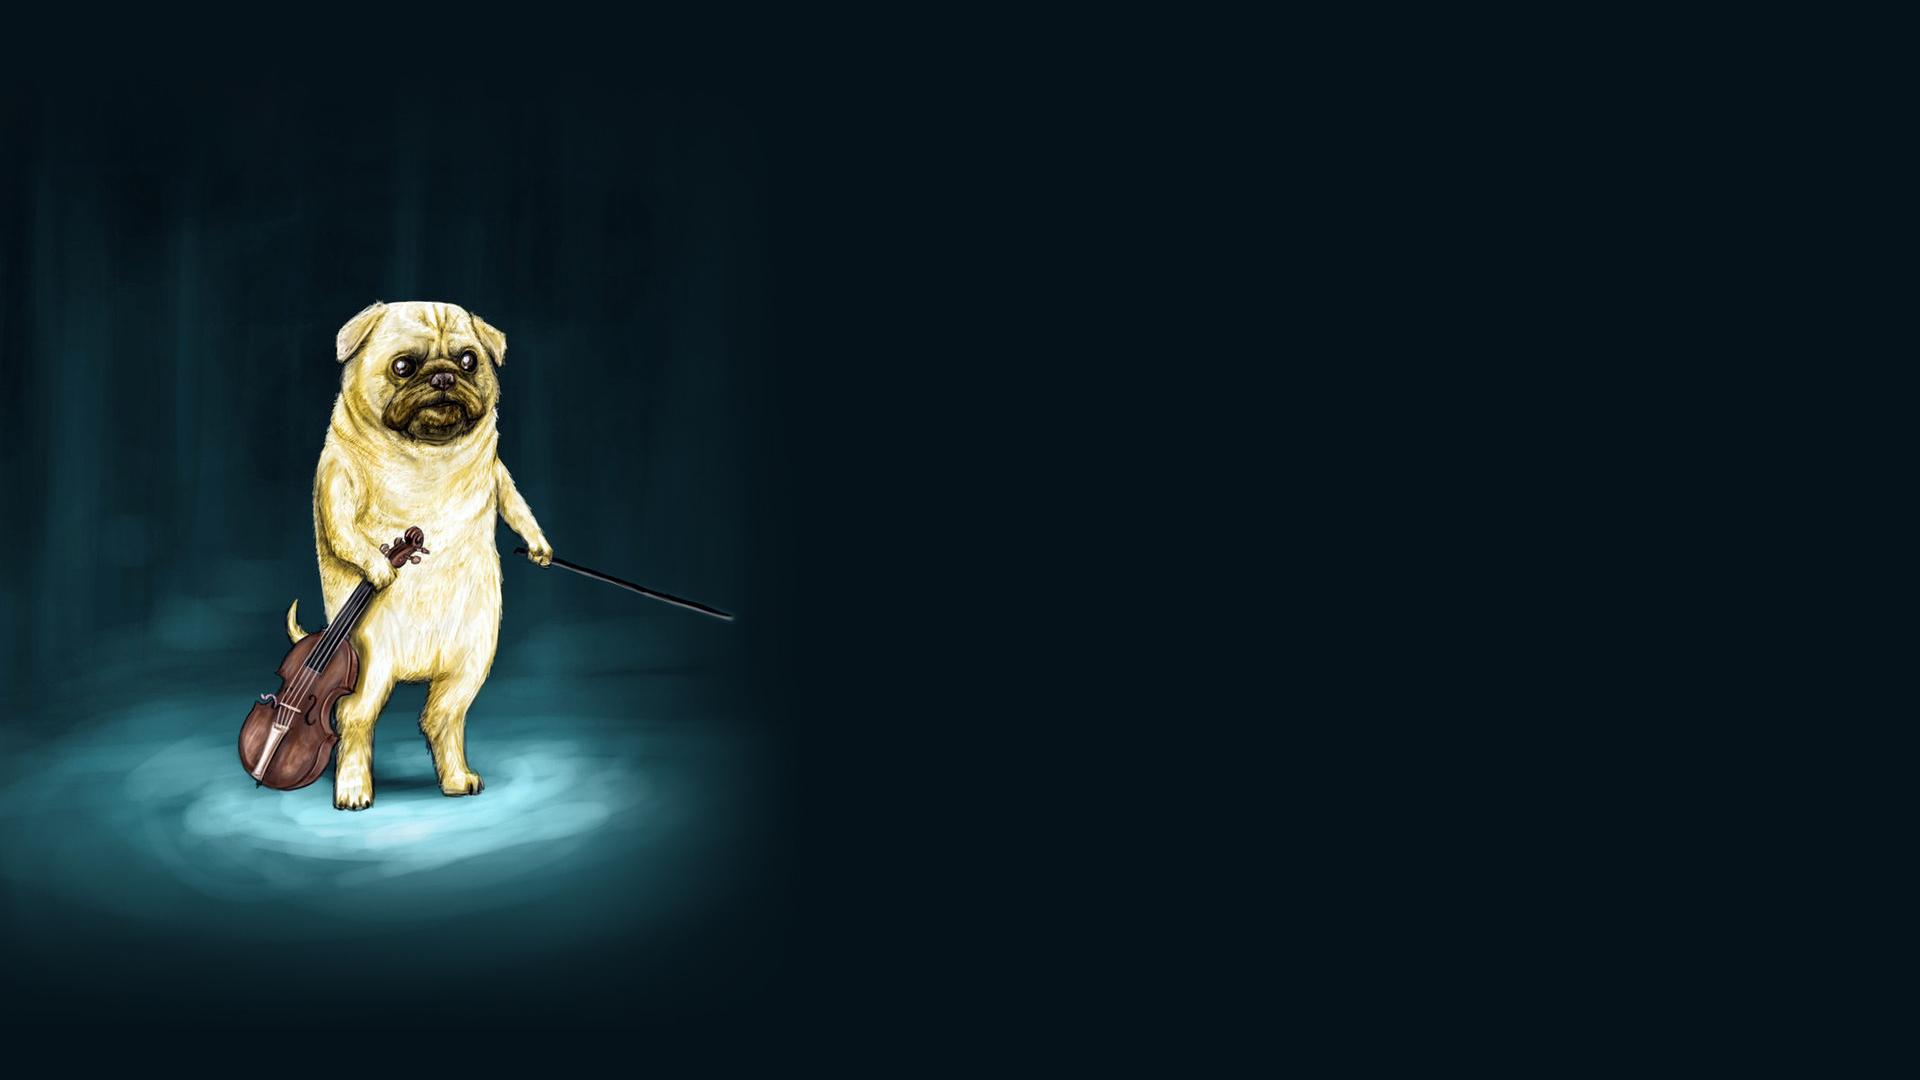 Niagara Falls Wallpaper Free Download Dog Violin Drawing Wtf Dogs Humor Funny Music Wallpaper